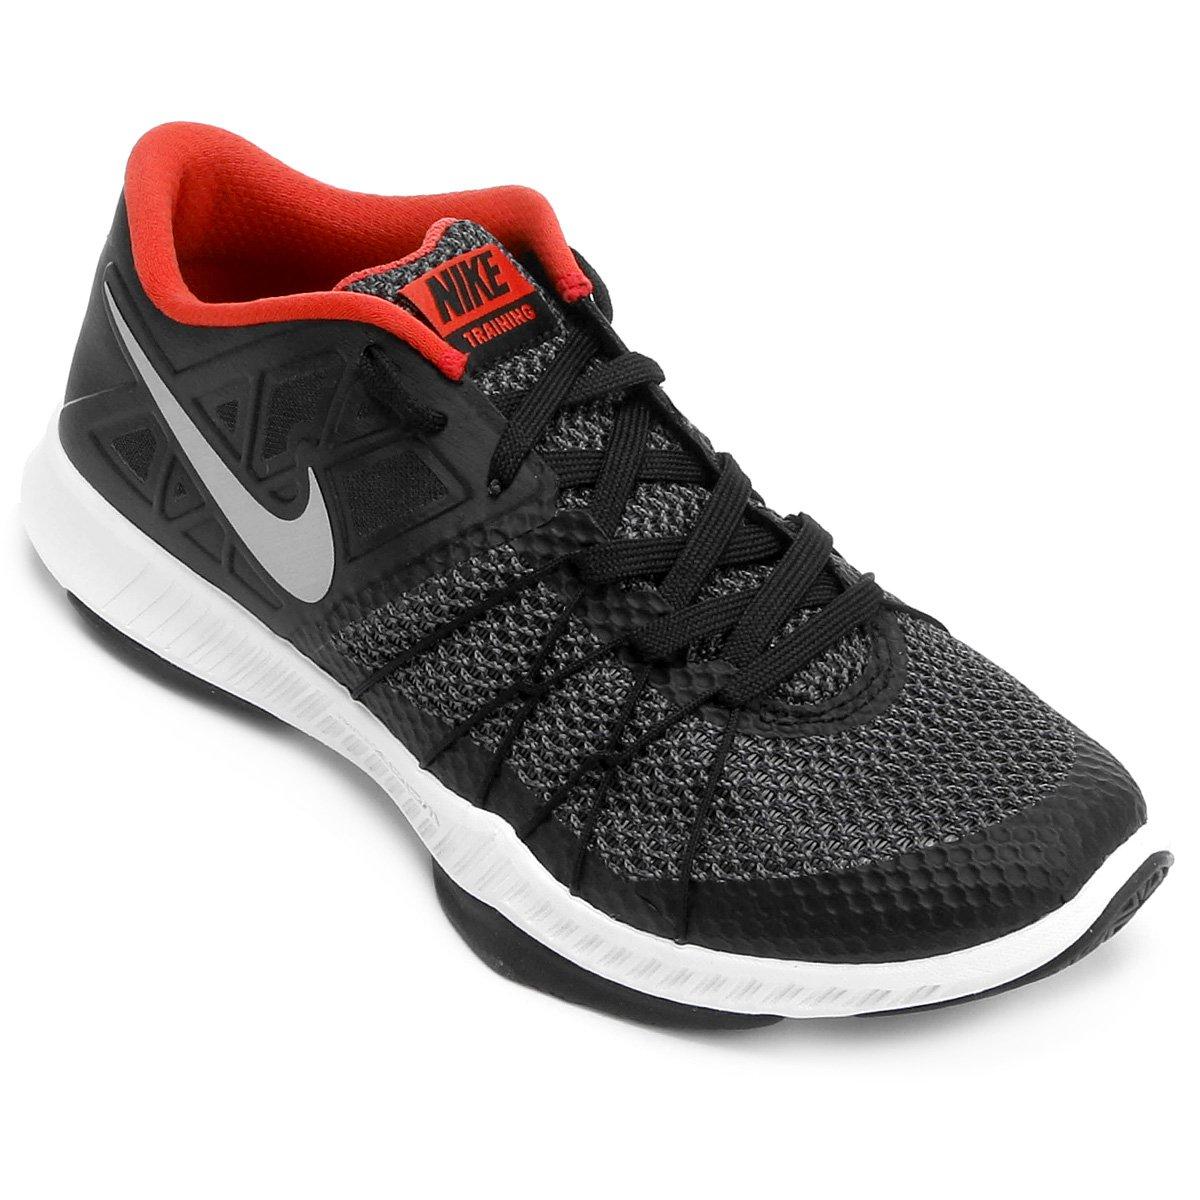 Nike Preto e Masculino Tênis Zoom Train Nike Tênis Laranja Augmento qApSwZEw